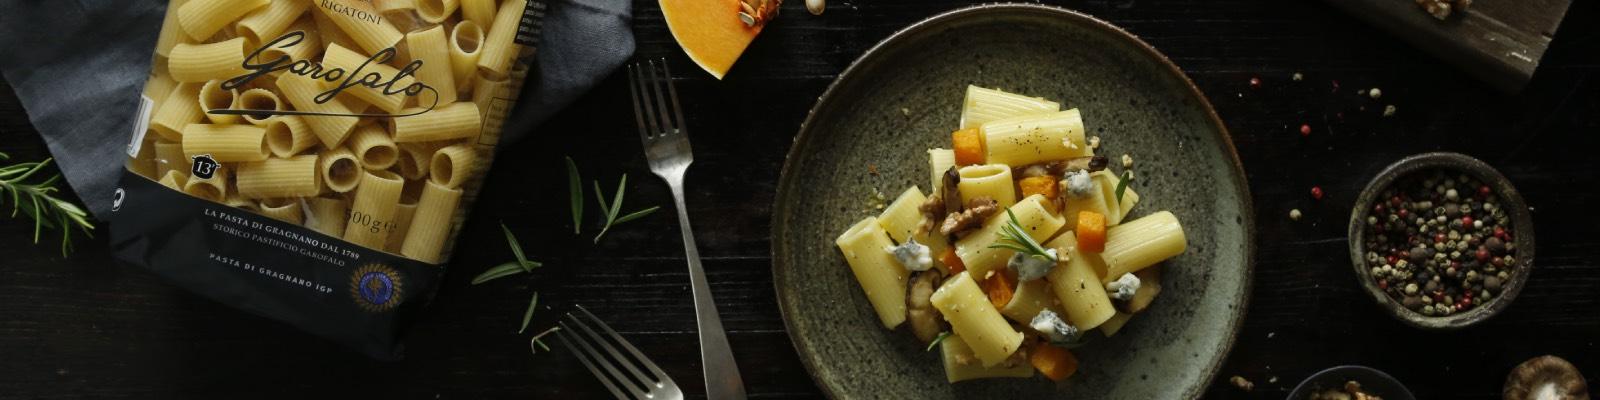 Pasta Garofalo - Rigatoni con calabaza asada, gorgonzola y salvia